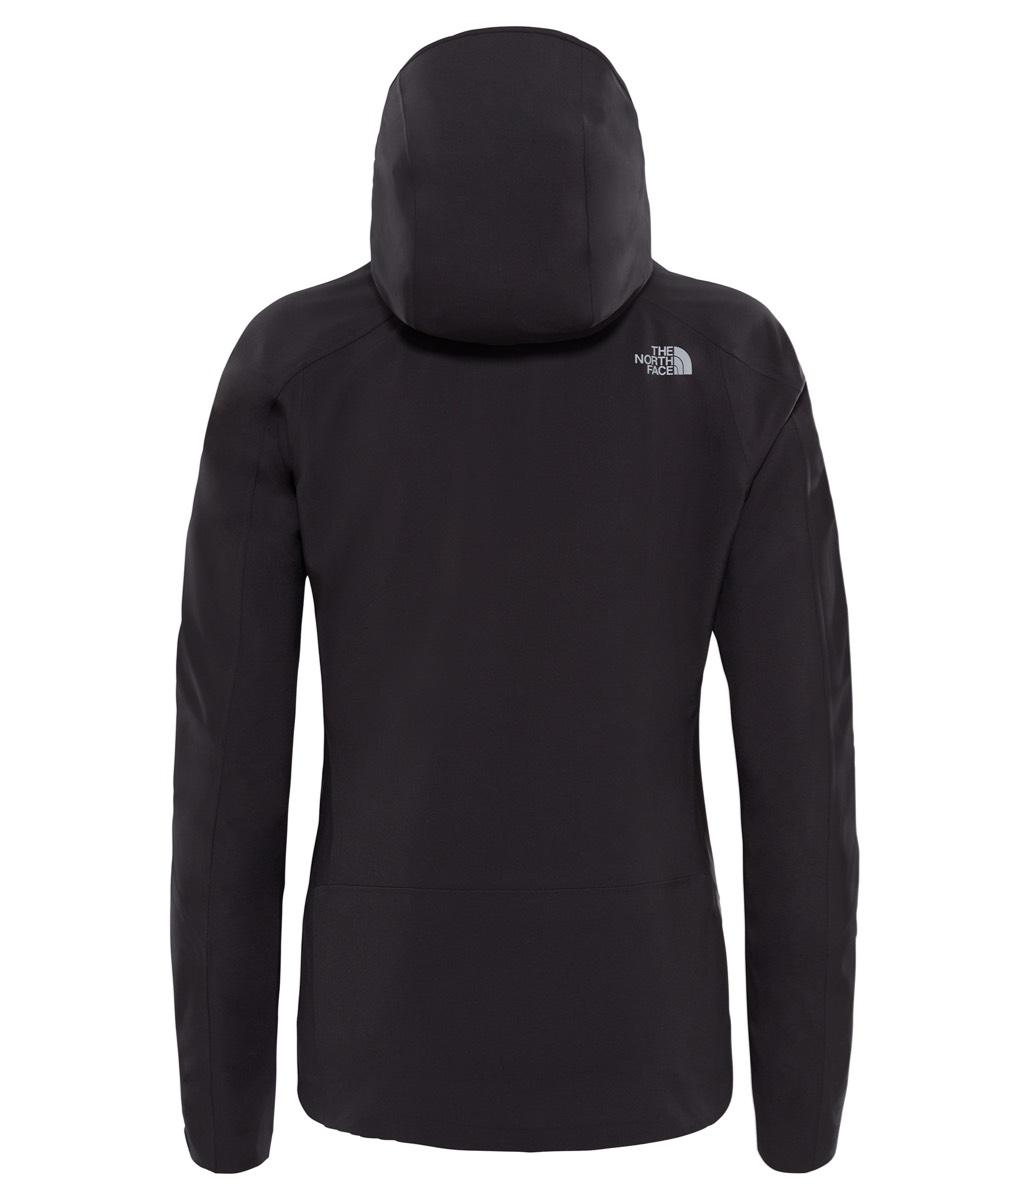 df03818fd The North Face Women's Apex Flex GTX 2.0 Jacket Tnf Black